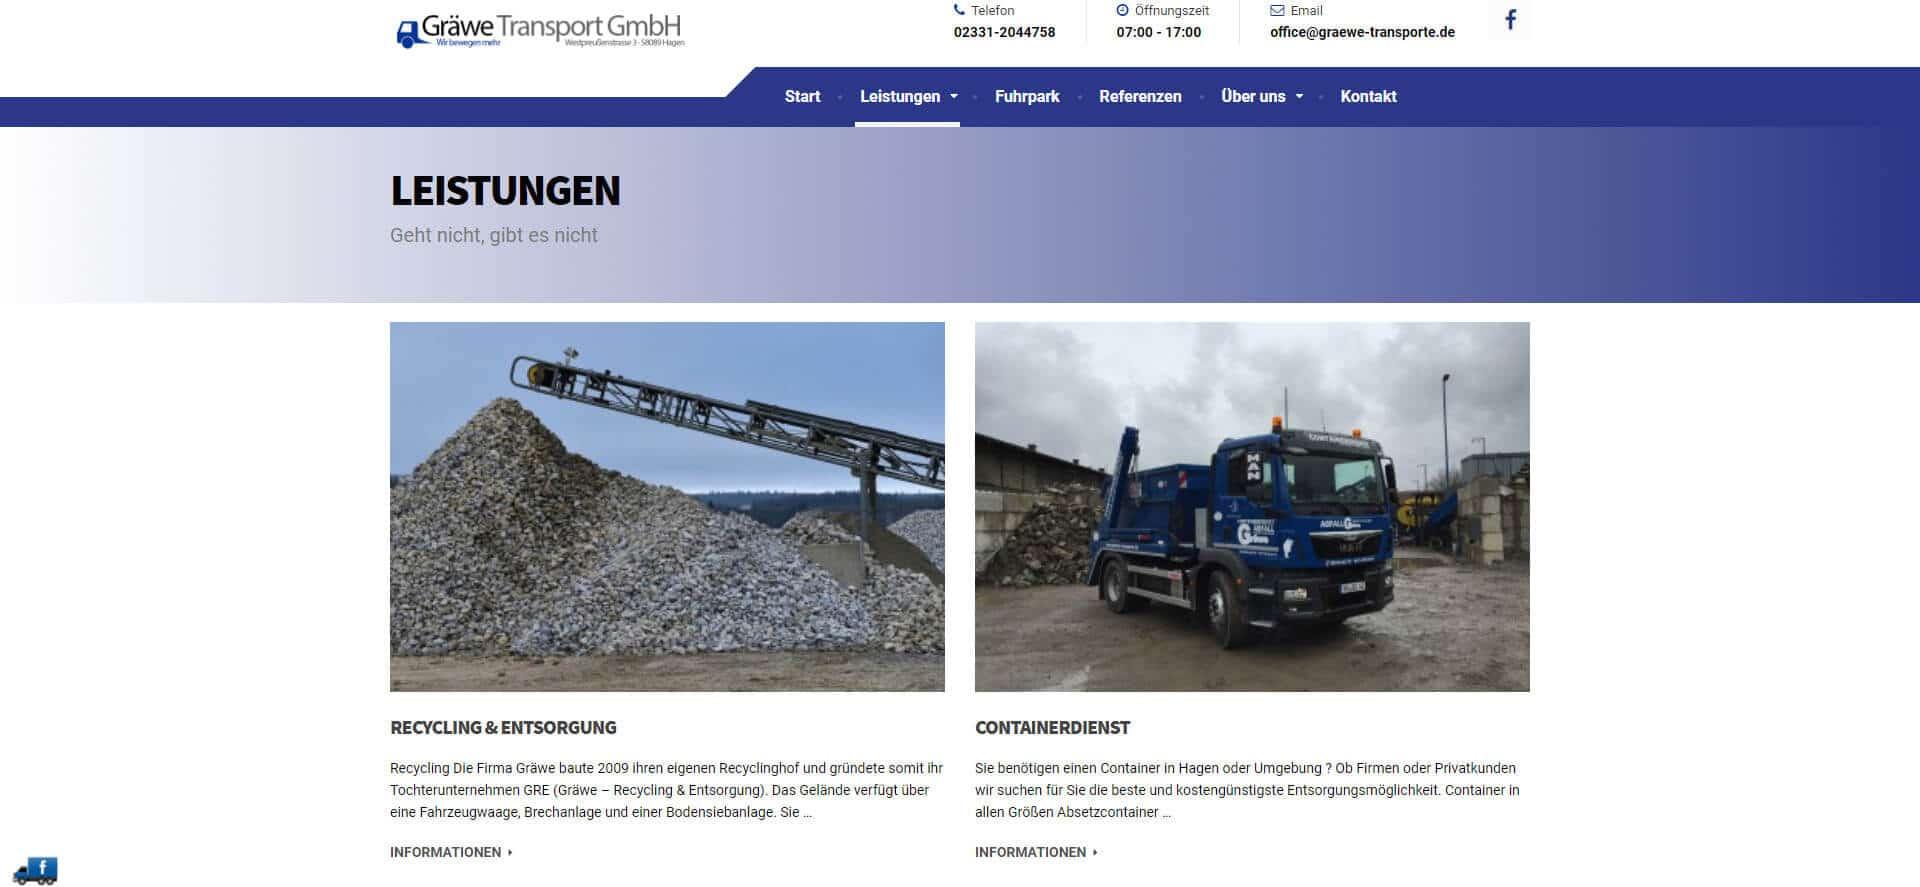 Graewe Transport GmbH